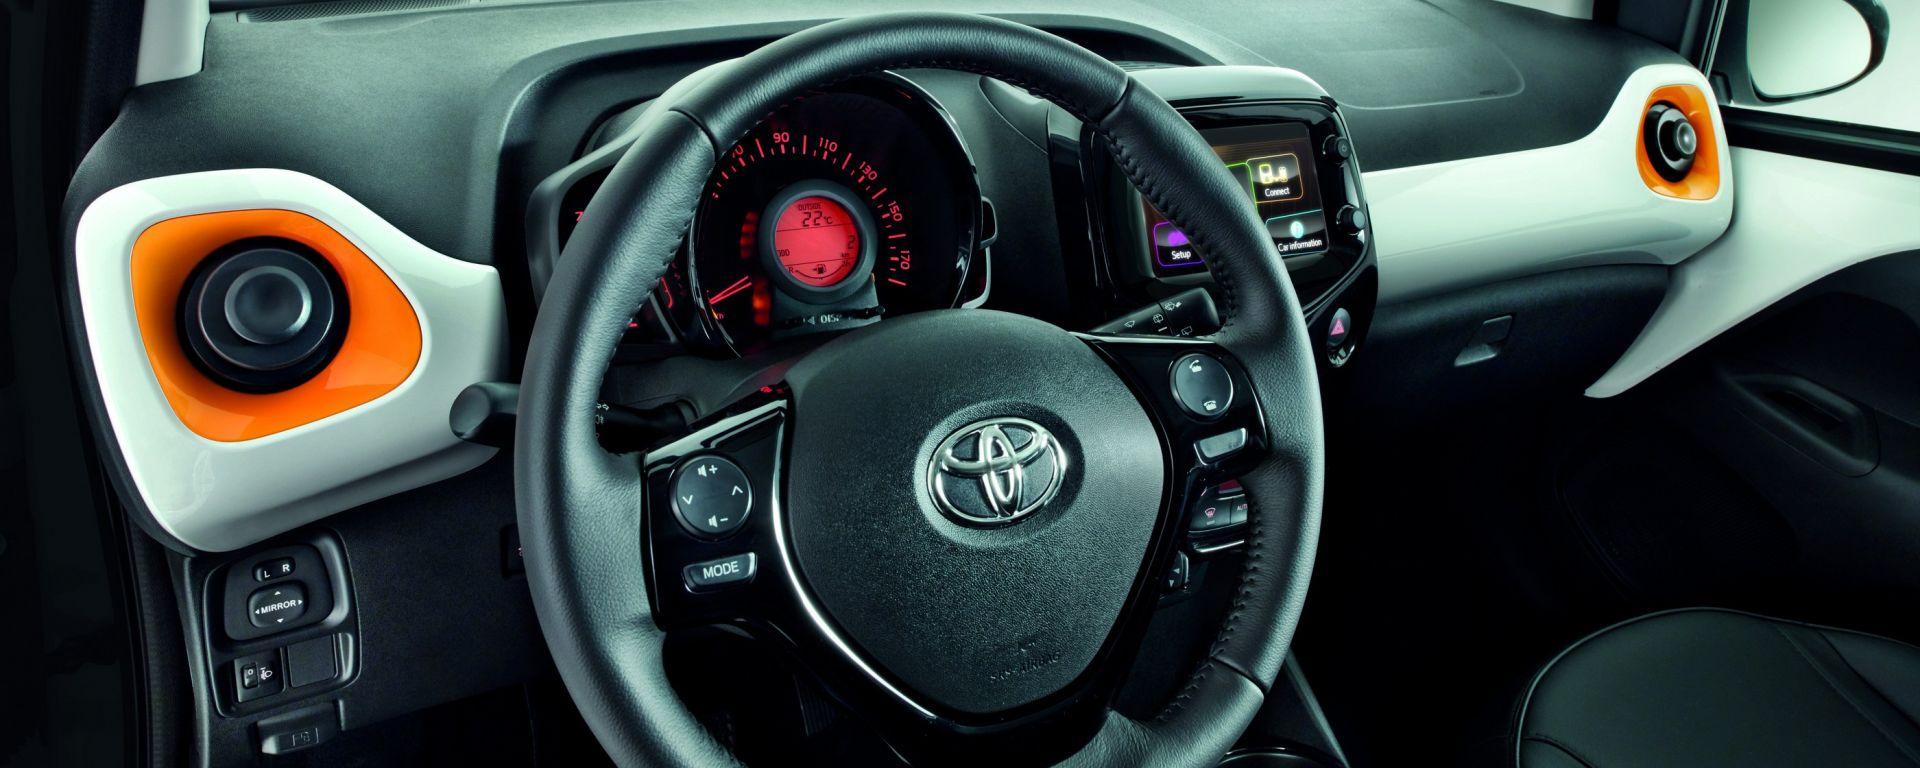 Toyota Aygo Amazon Edition